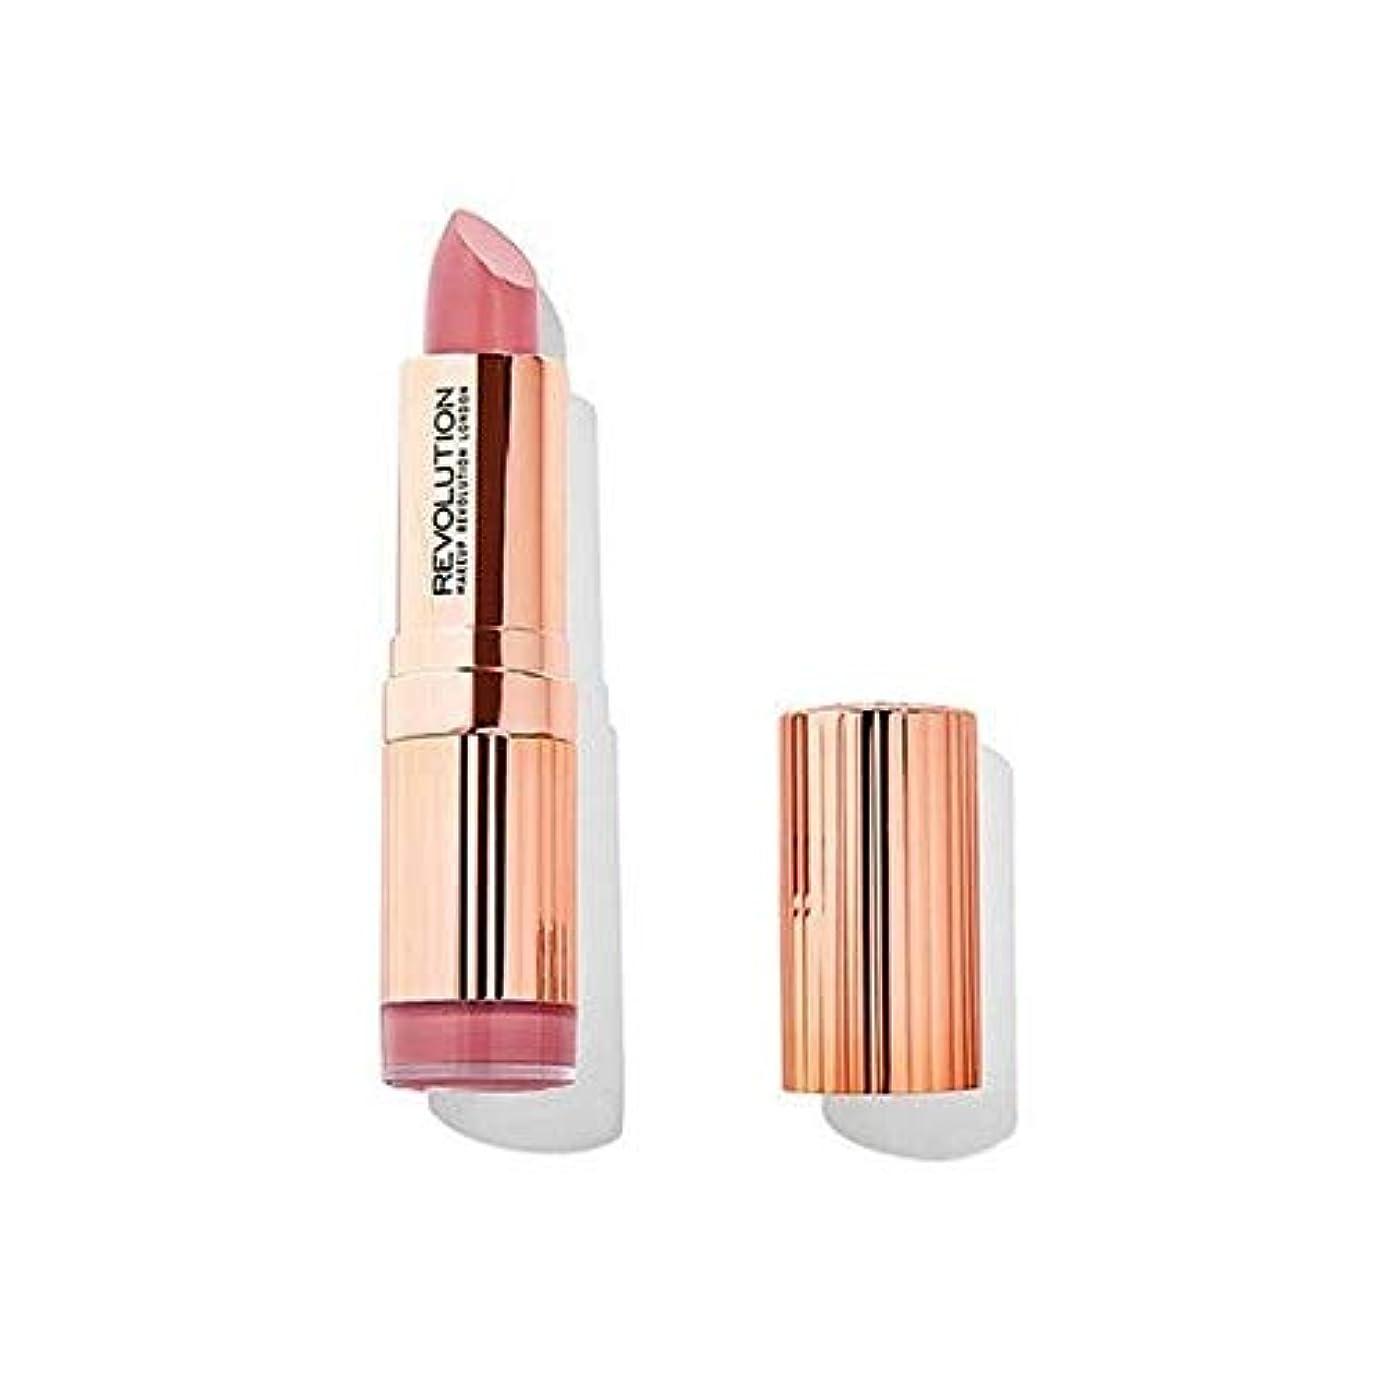 [Revolution ] ブレンド革命のルネサンス口紅 - Revolution Renaissance Lipstick Blended [並行輸入品]